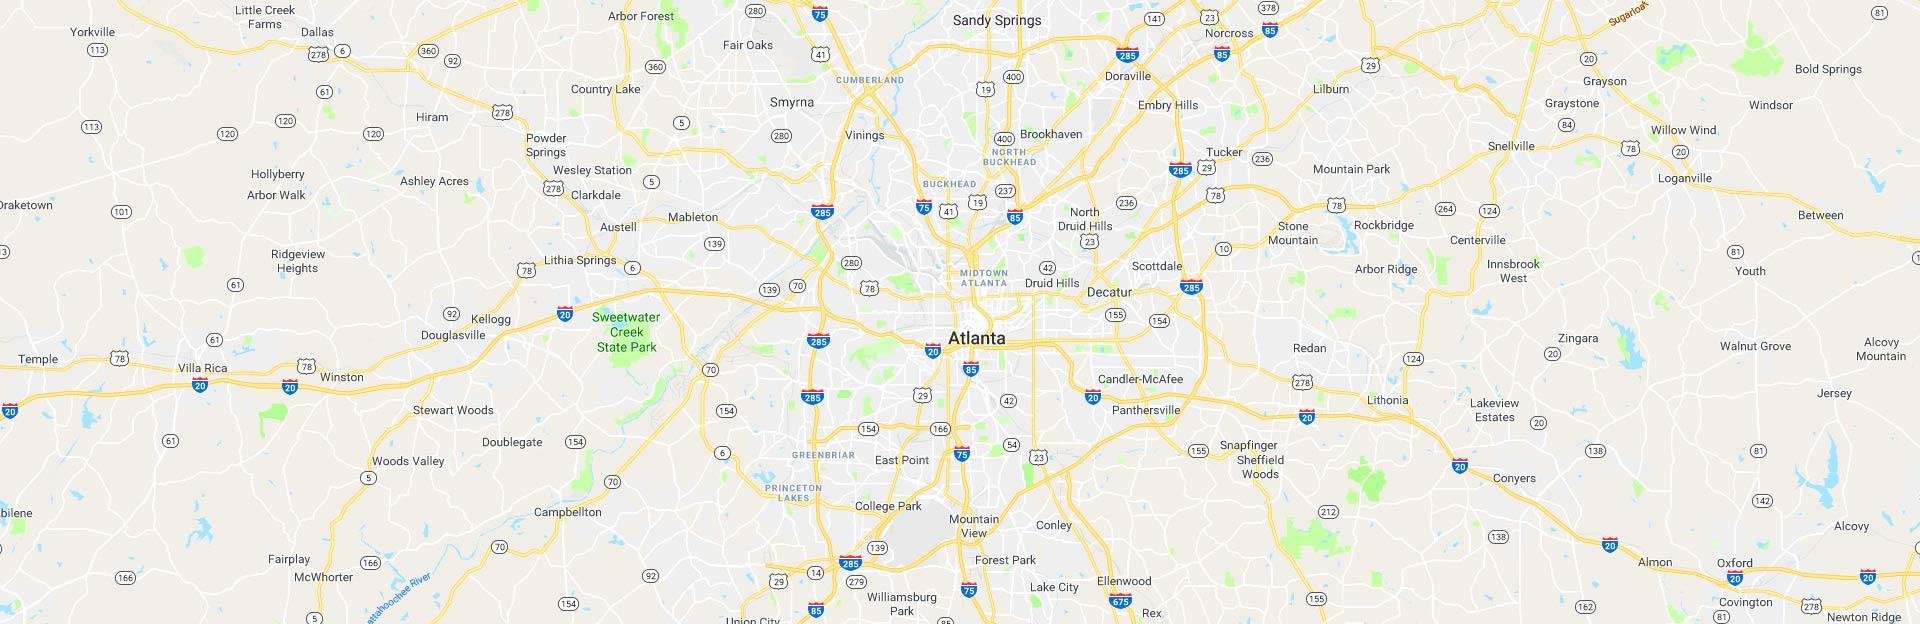 atlanta-map-wide_1920